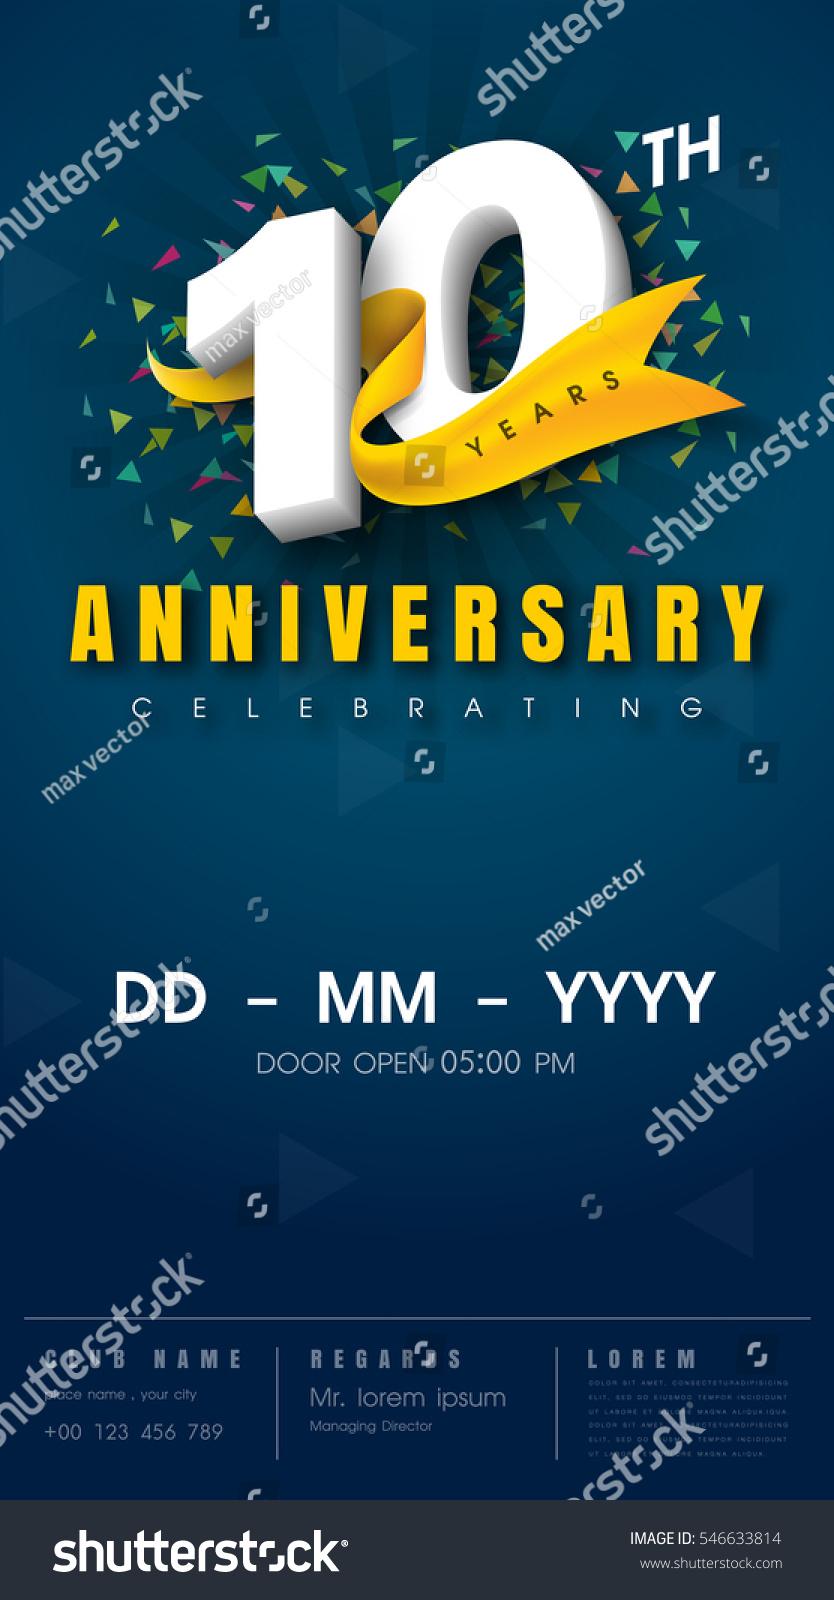 10 Years Anniversary Invitation Card Celebration Stock Vector ...